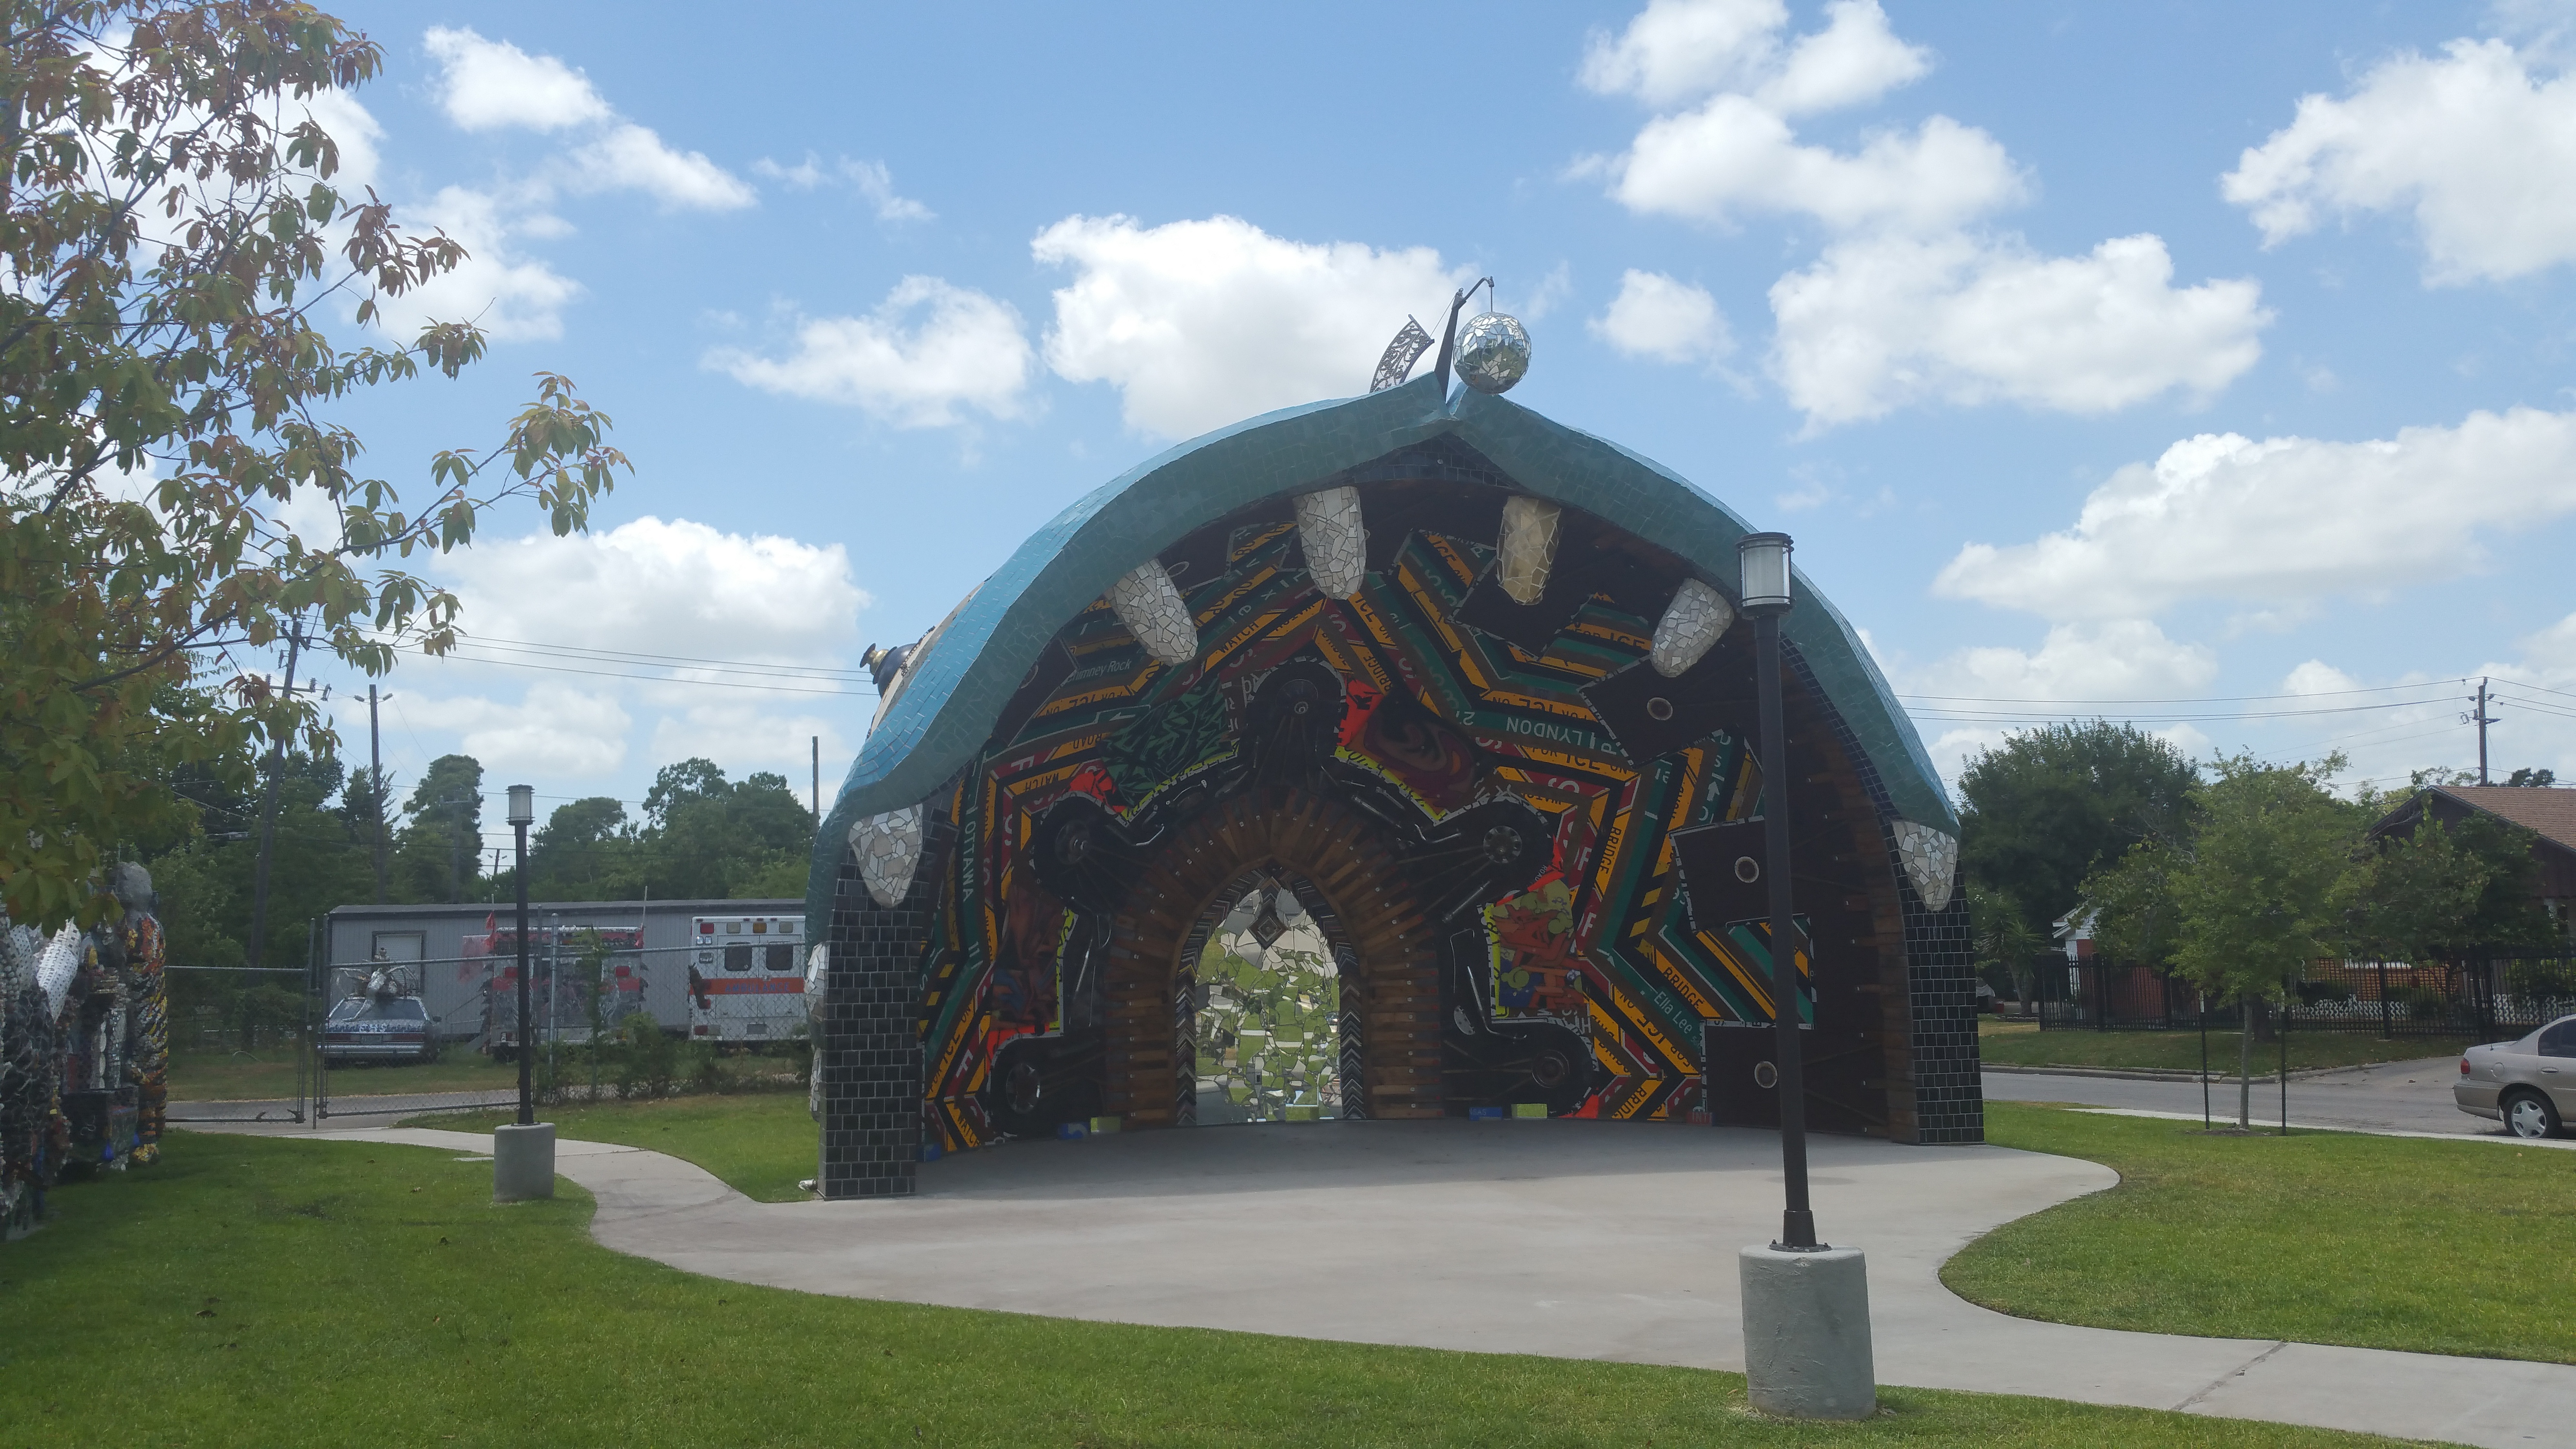 File:Gulfgate- Pine Valley, Houston, TX, USA - panoramio ...